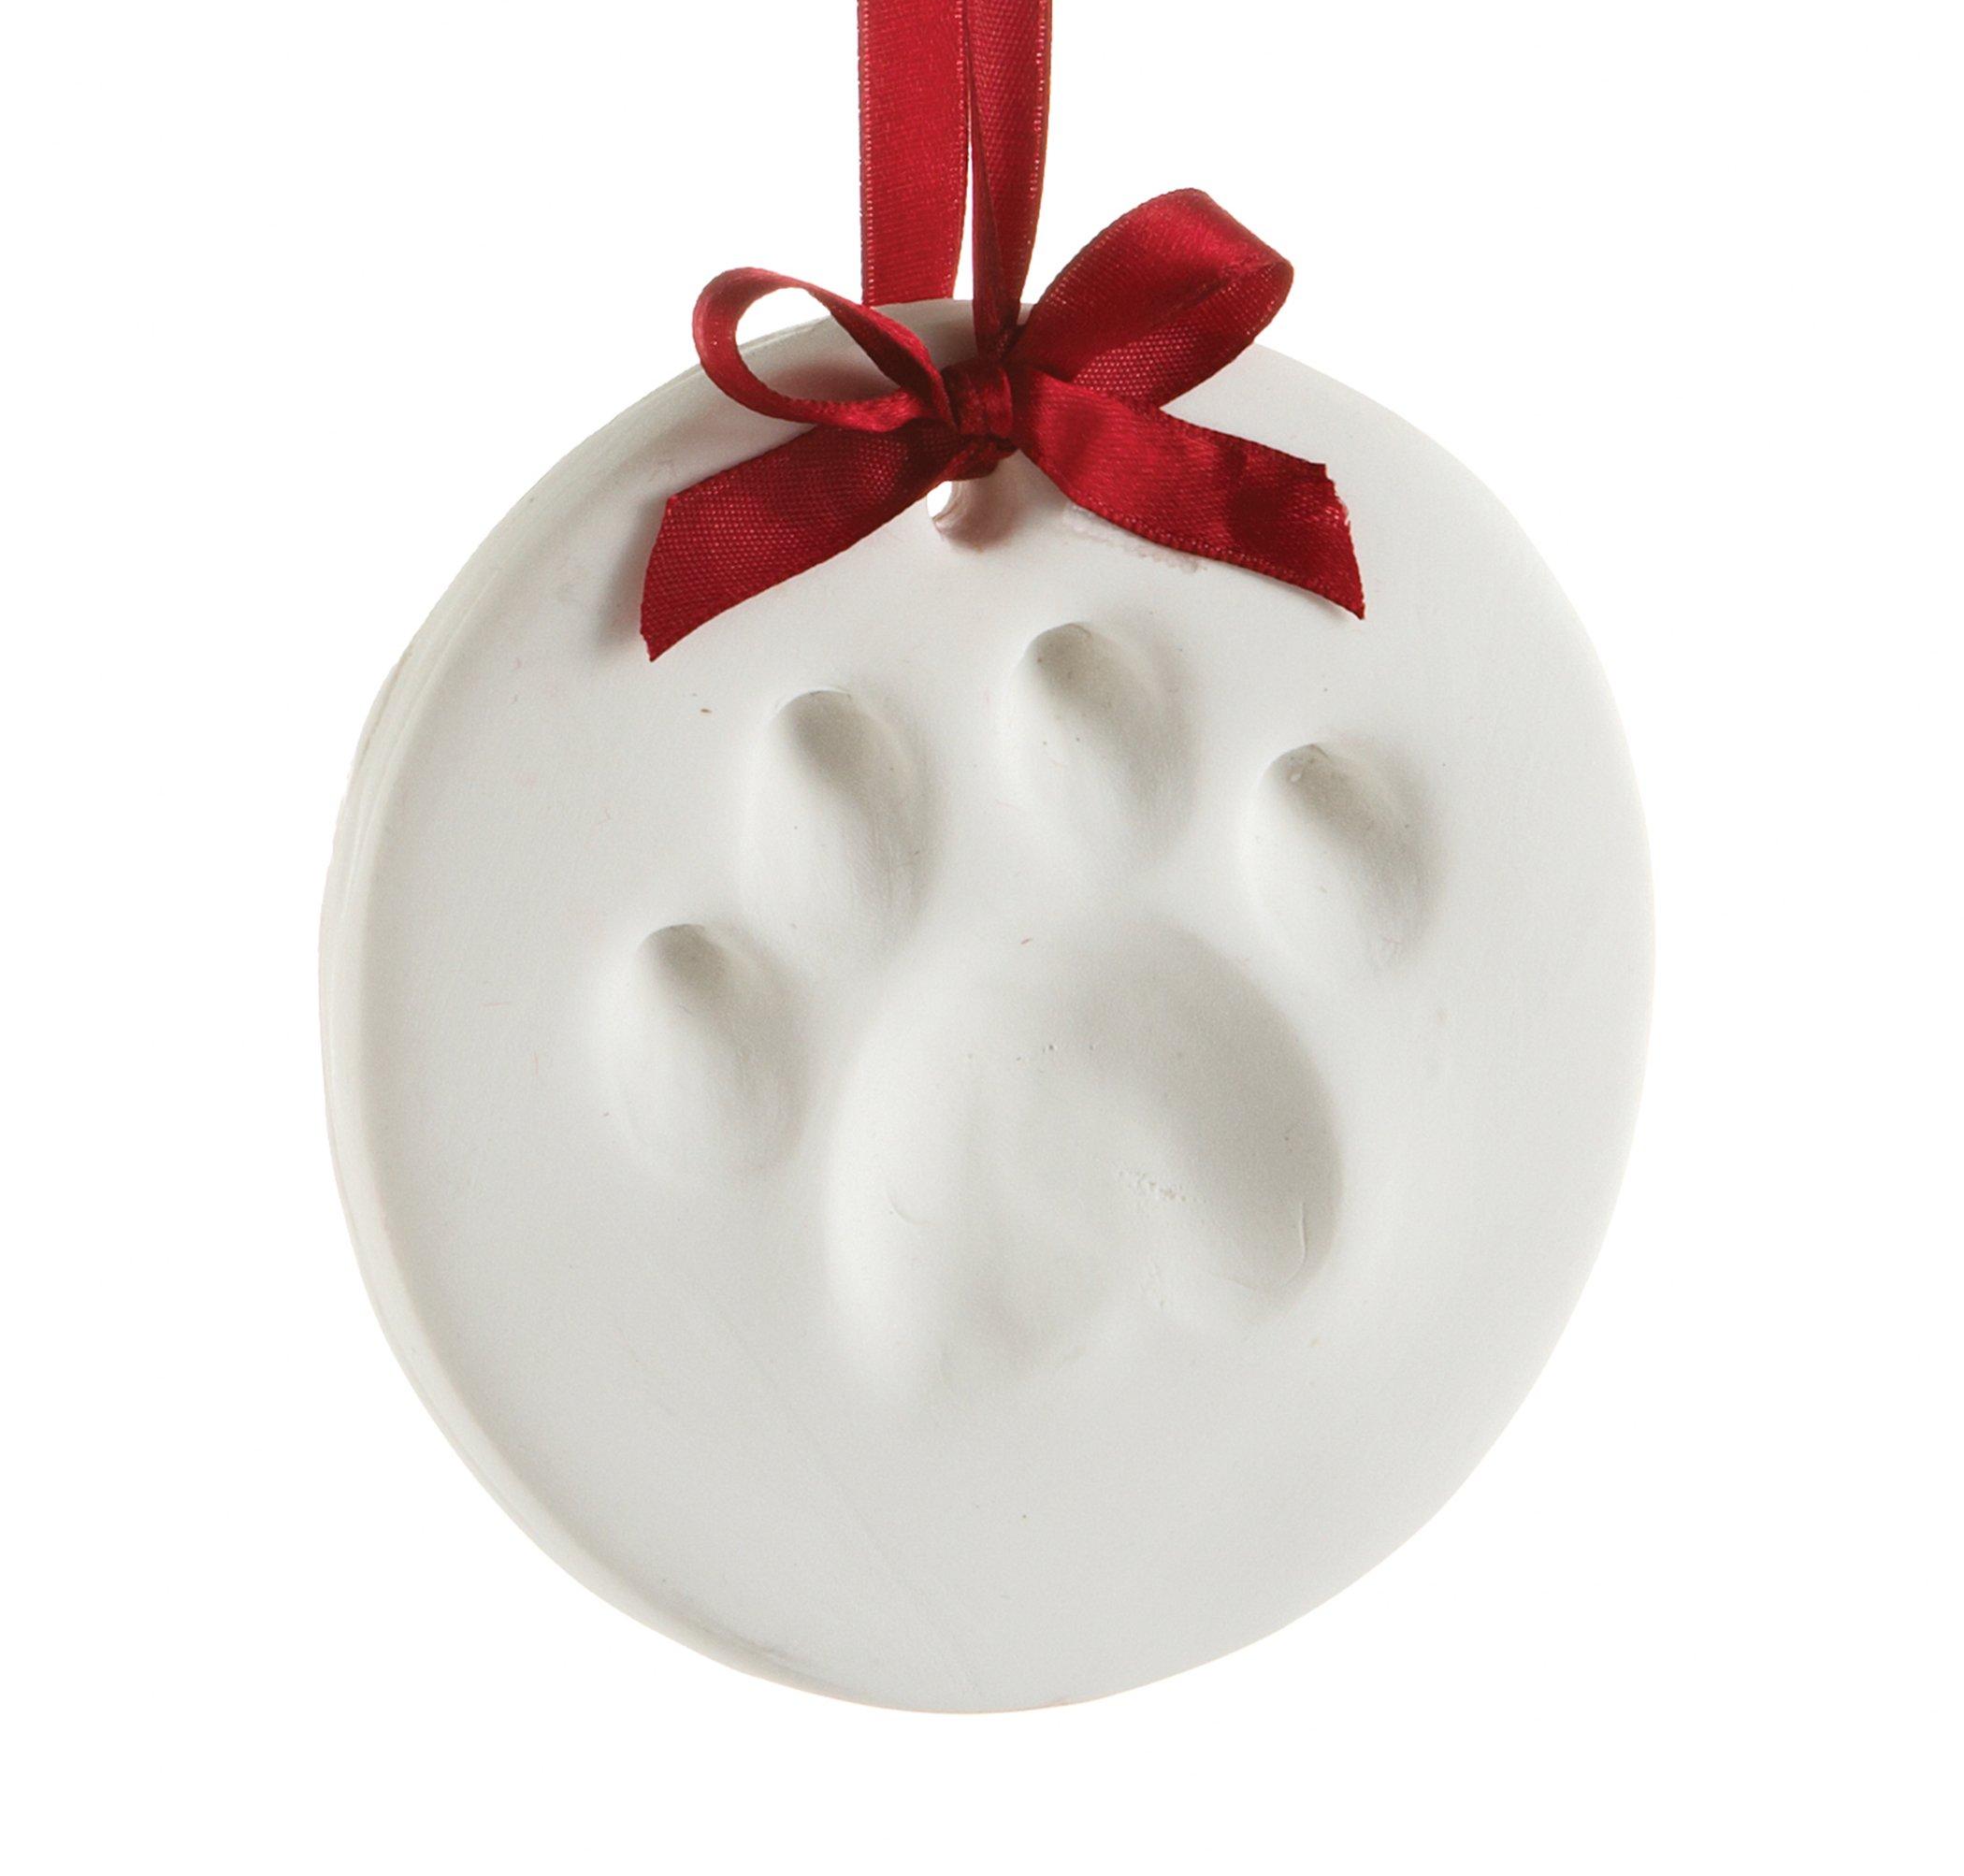 Pearhead Pet Paw Prints Dog or Cat Paw Print Hanging DIY Keepsake, Holiday by Pearhead